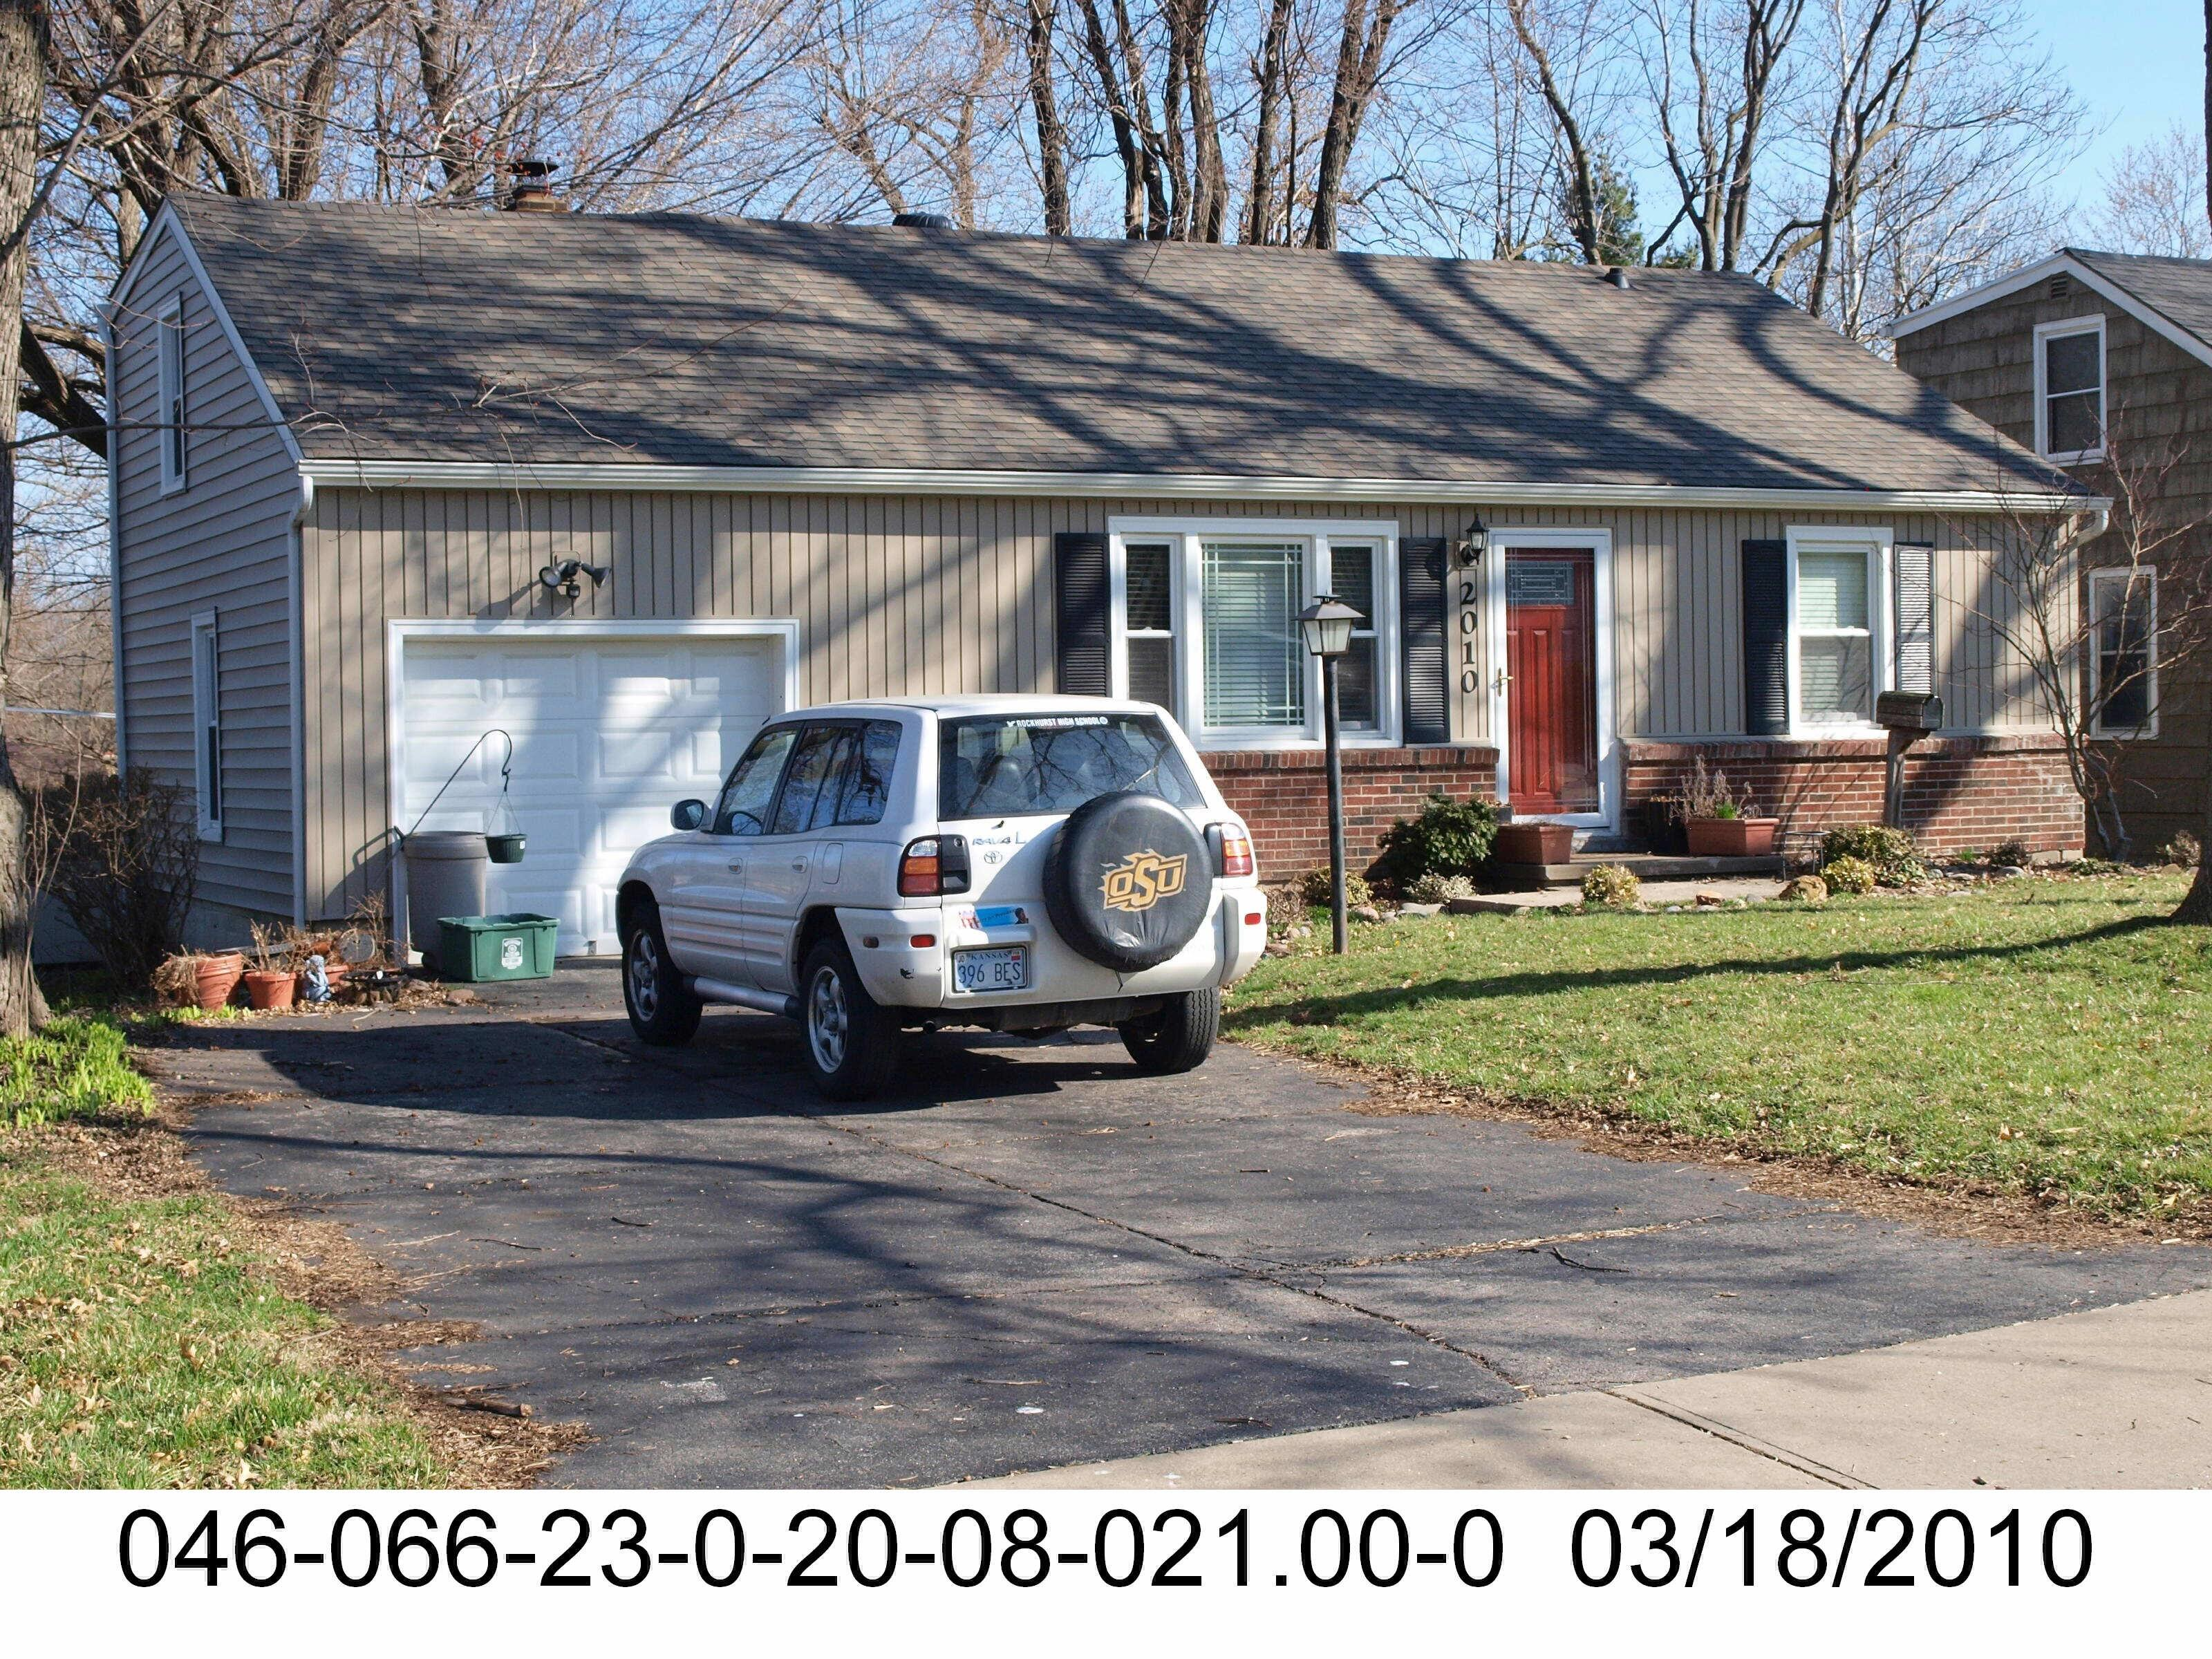 Kansas johnson county prairie village -  189 388 Property In Prairie Village Kansas